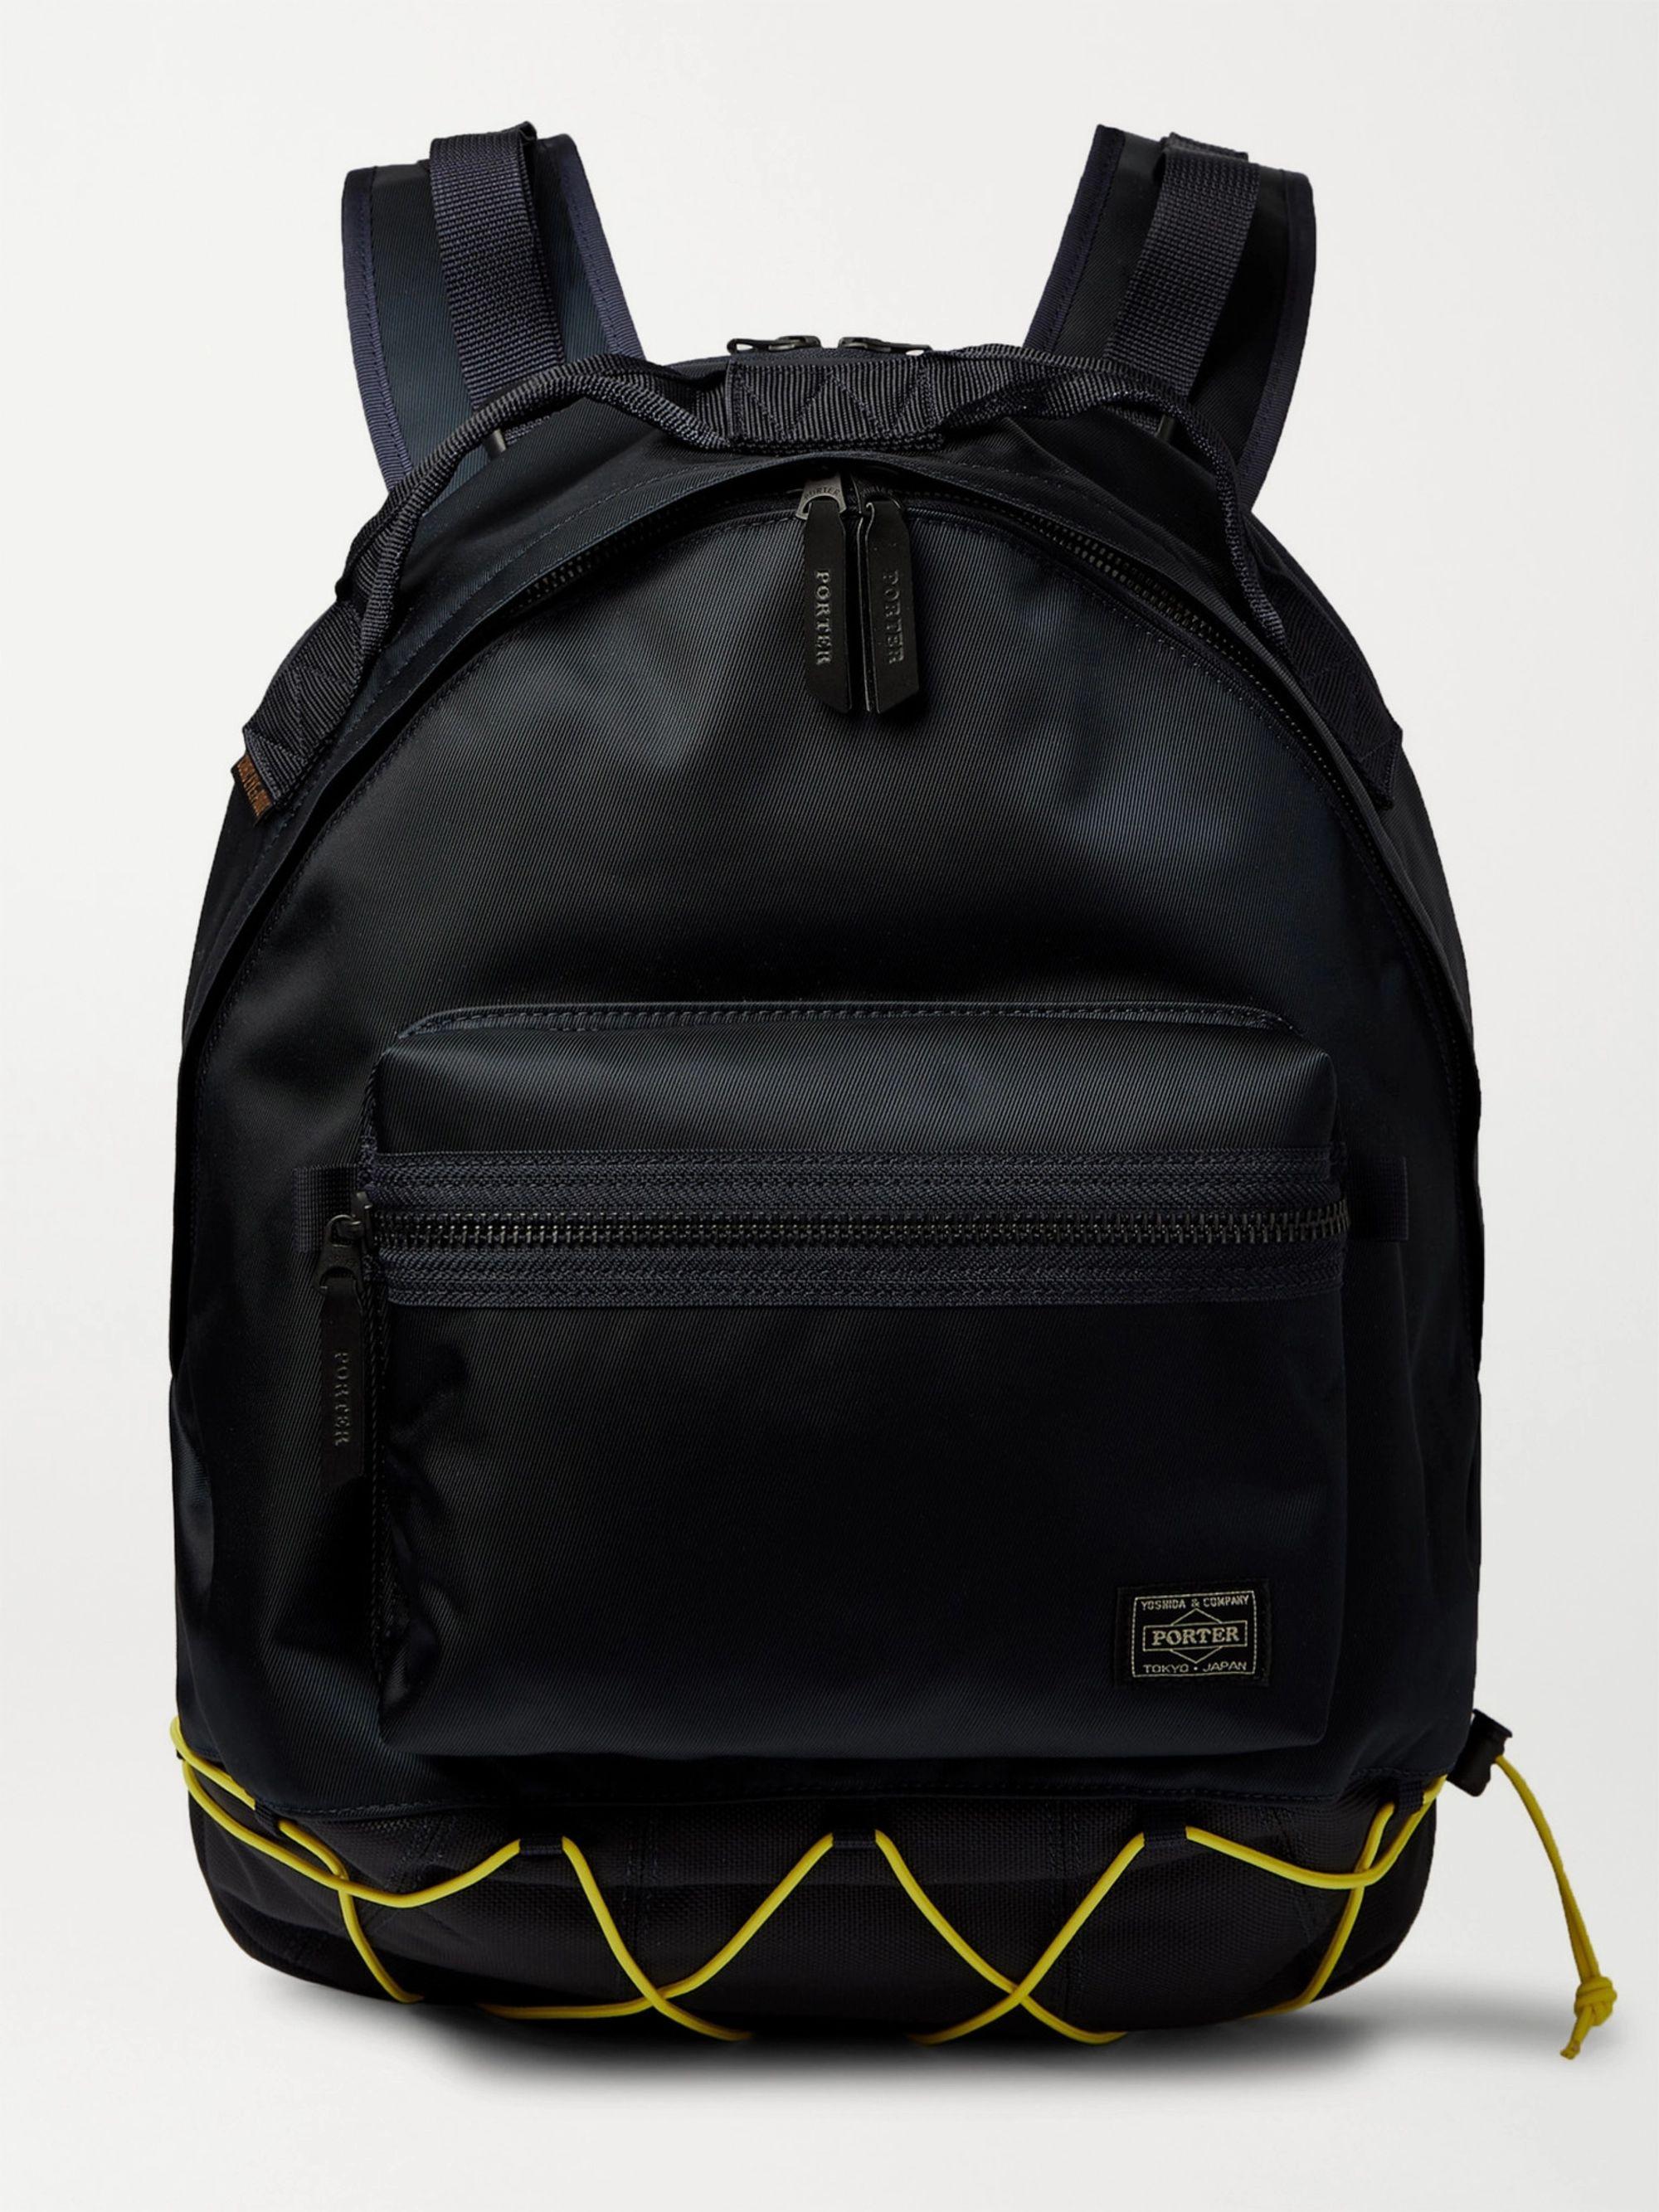 PORTER-YOSHIDA & CO CORDURA-Trimmed Nylon Backpack,Black